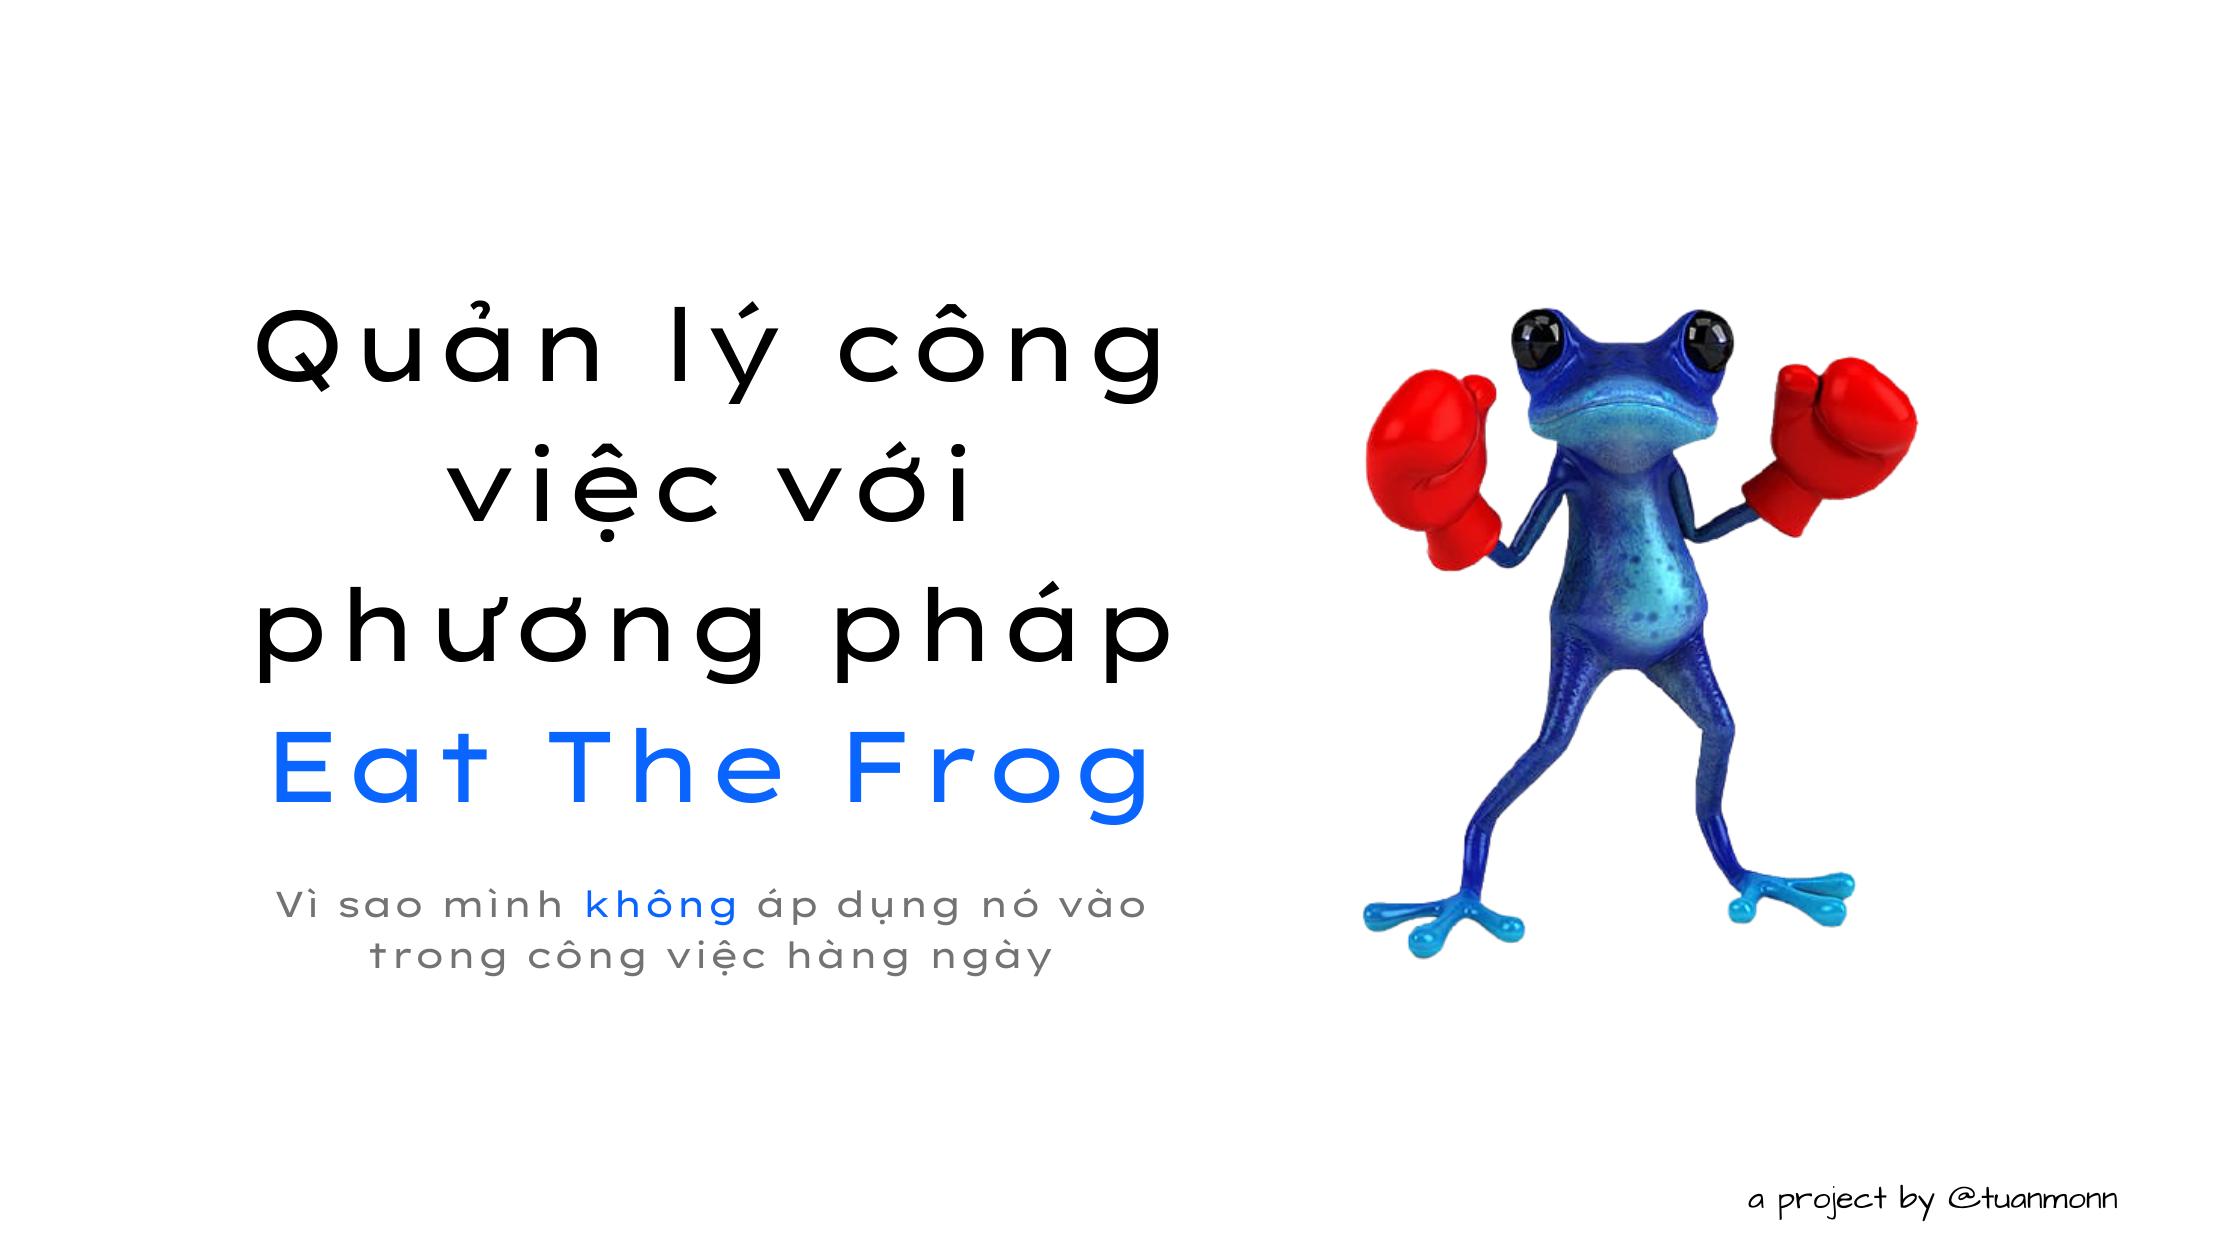 phuong-phap-eat-the-frog